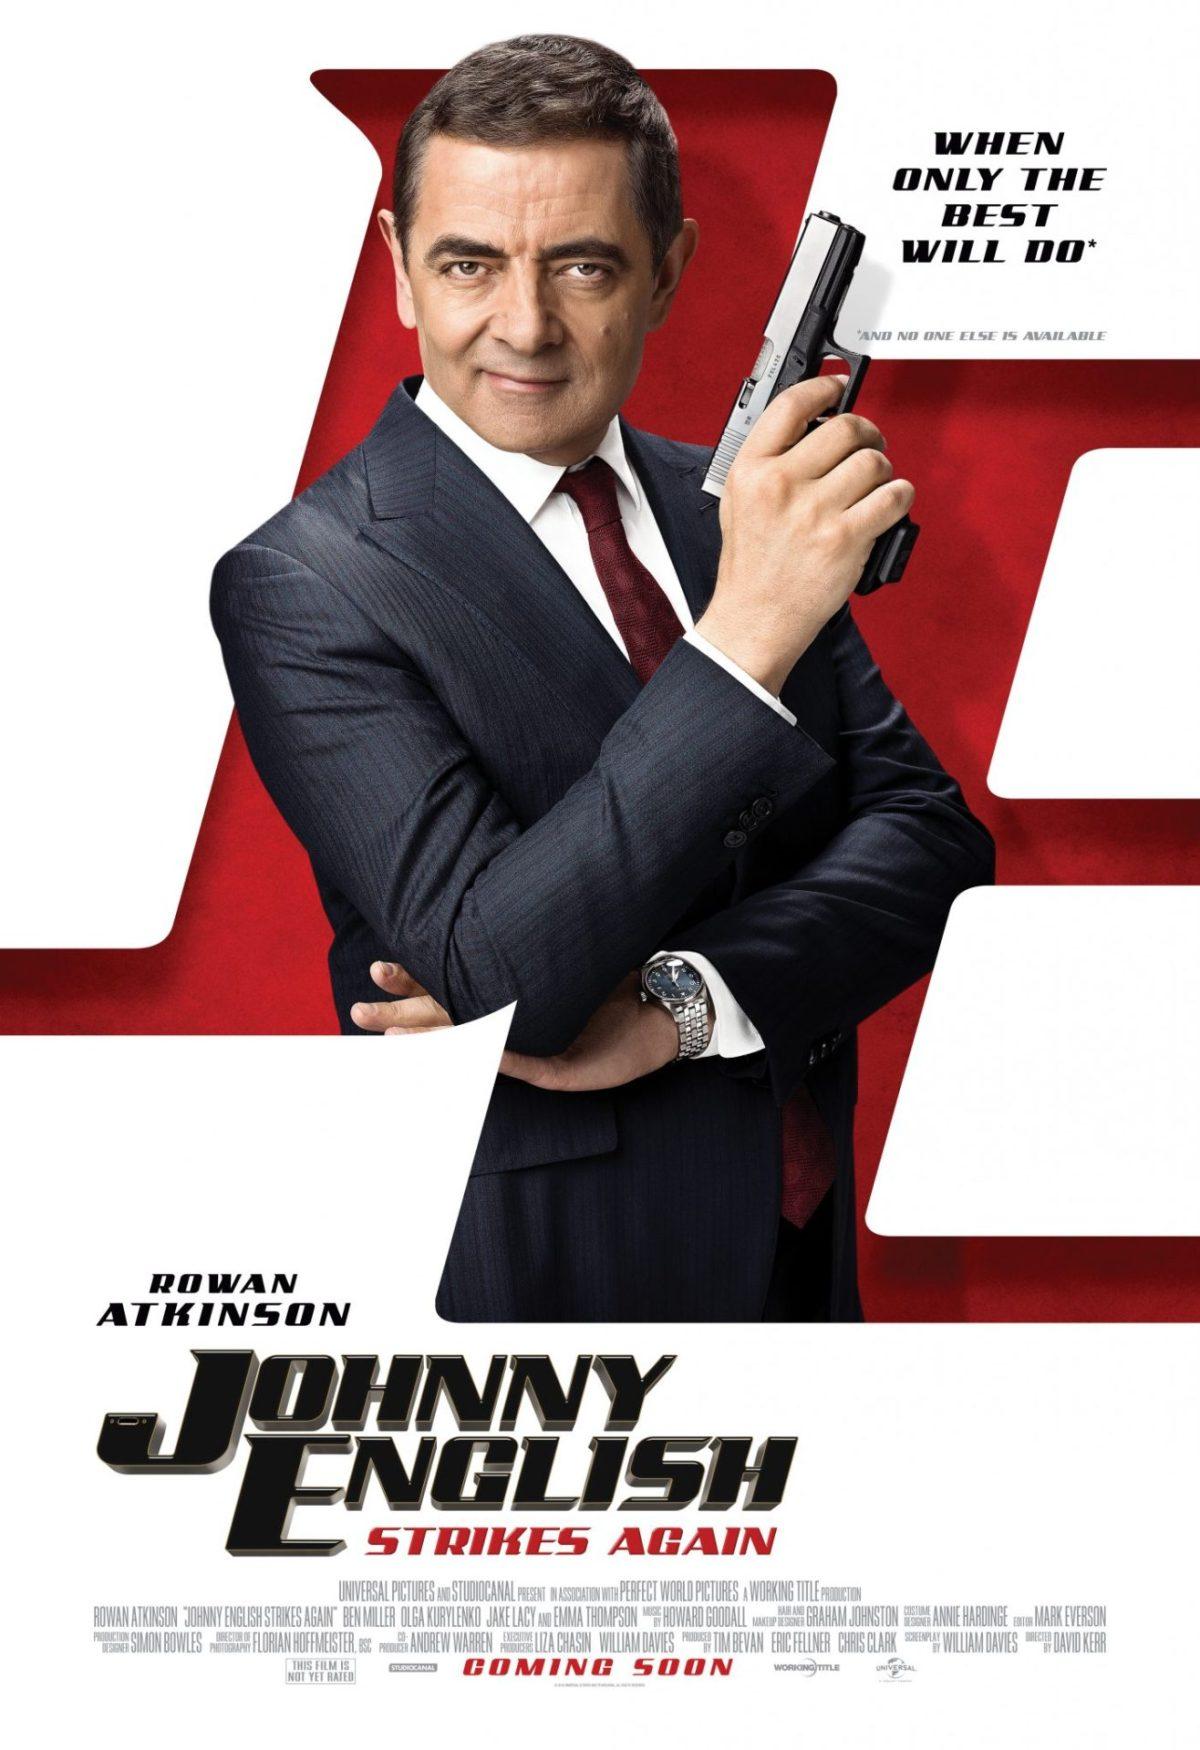 JohnnyEnglish3_1sht_Eng